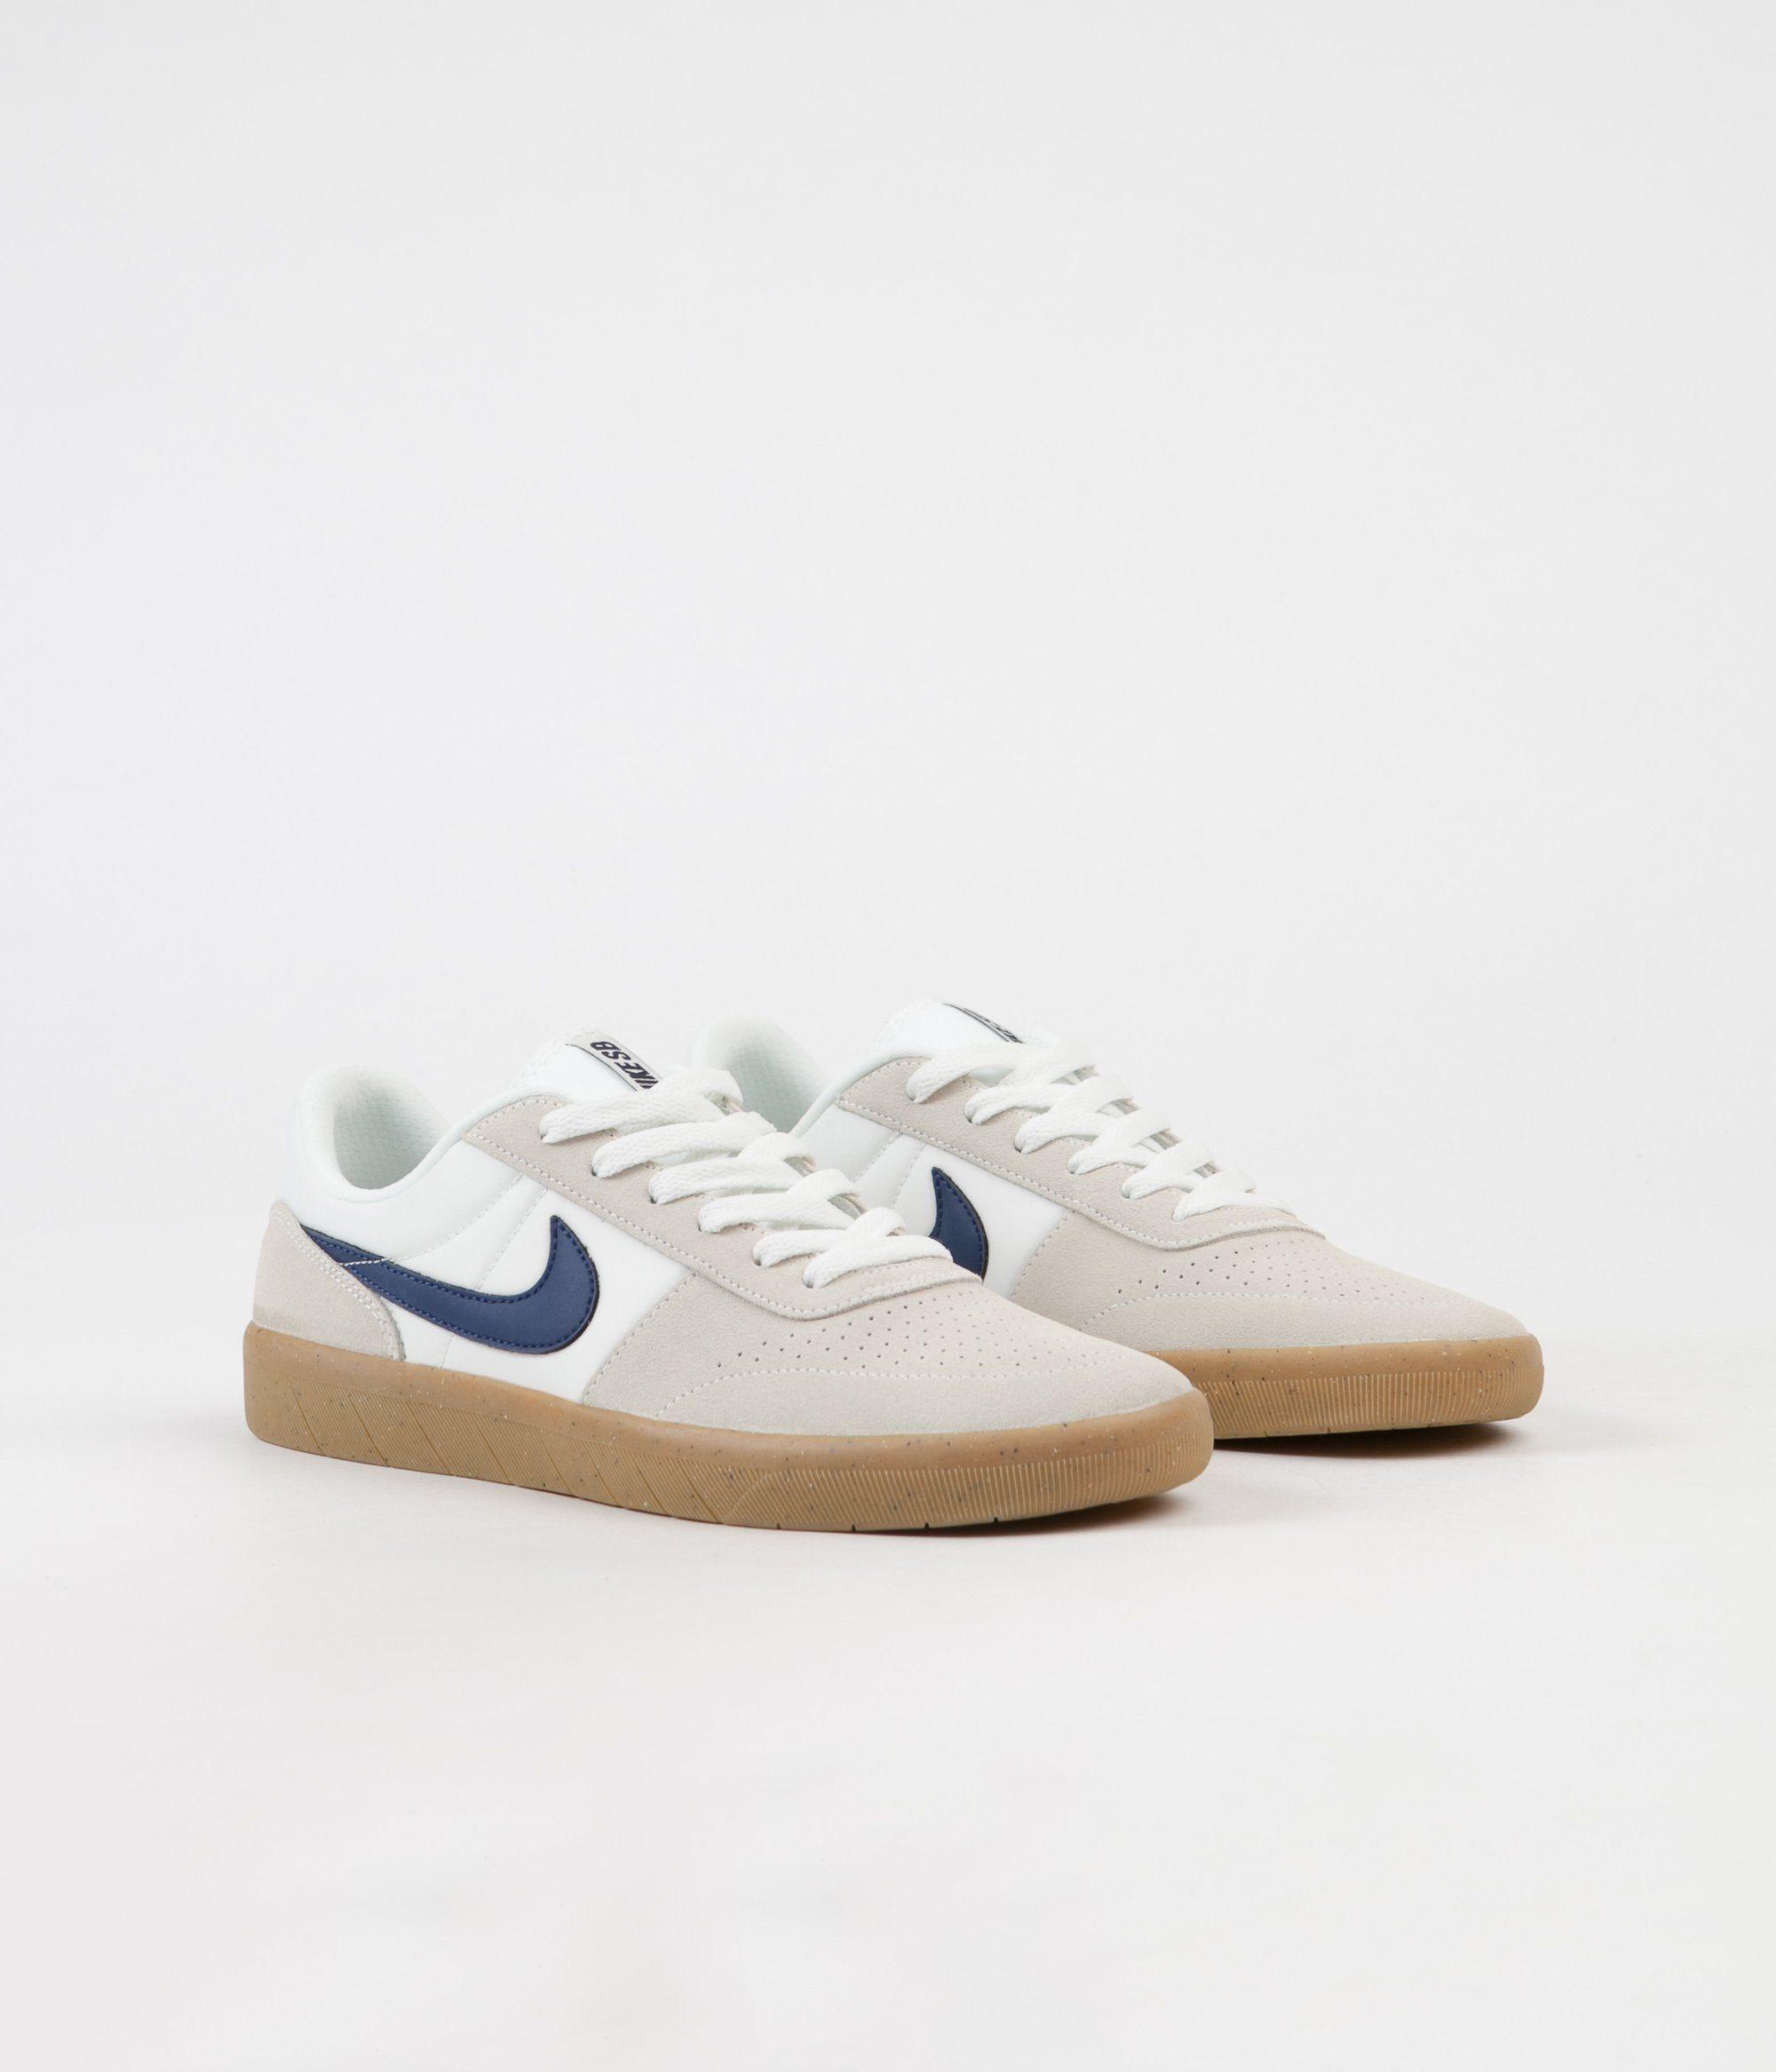 Nike Sb Team Classic Shoes Summit White Blue Void White Classic Shoes Nike Sb Shoes Nike Sb